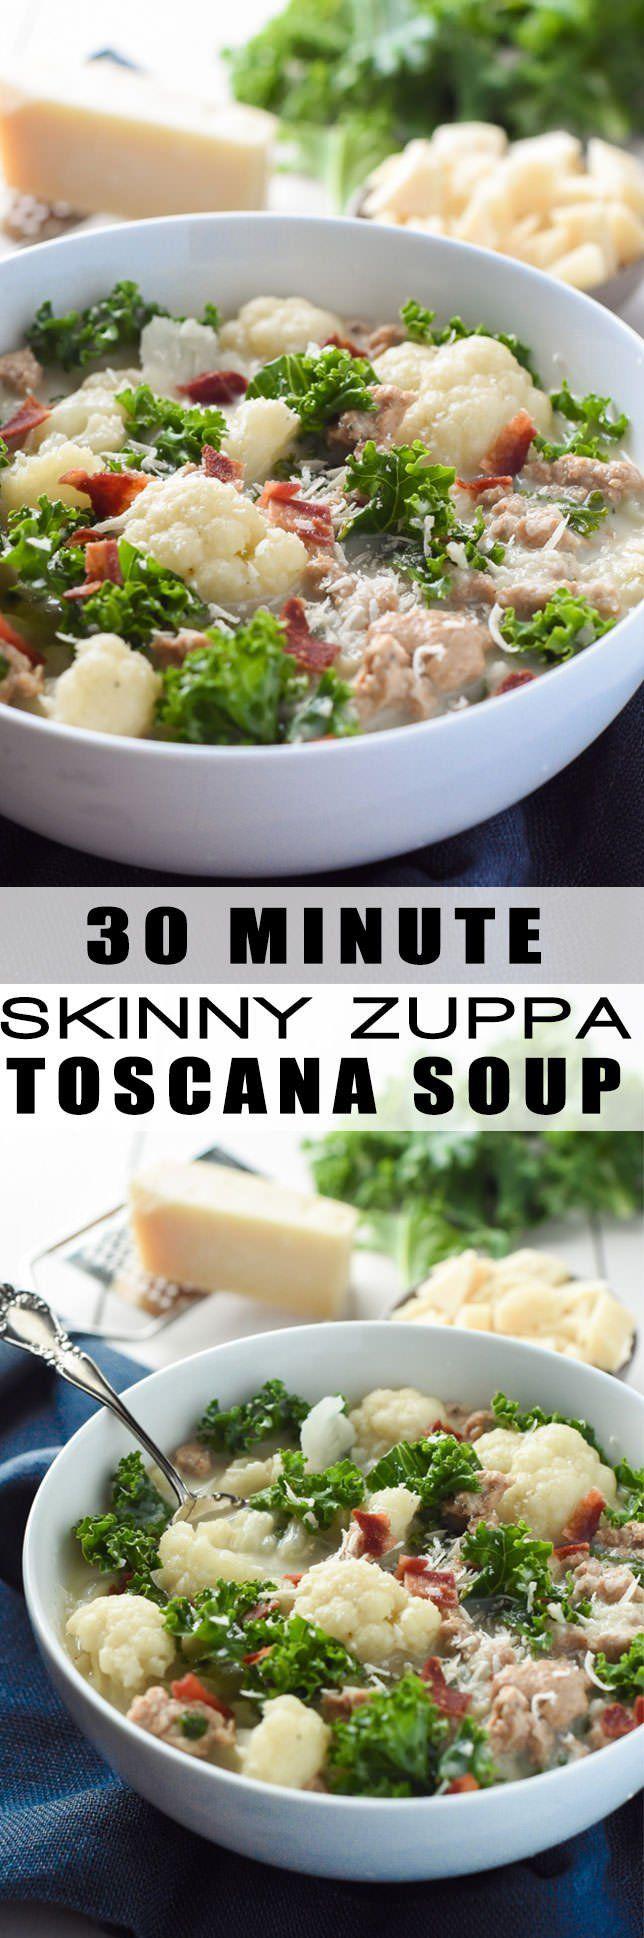 Healthy Zuppa Toscana Soup | Olive Garden, Cauliflower, Turkey Sausage, Kale, Recipe, Low Carb, Italian Soup, Paleo, Skinny, Stovetop, Light